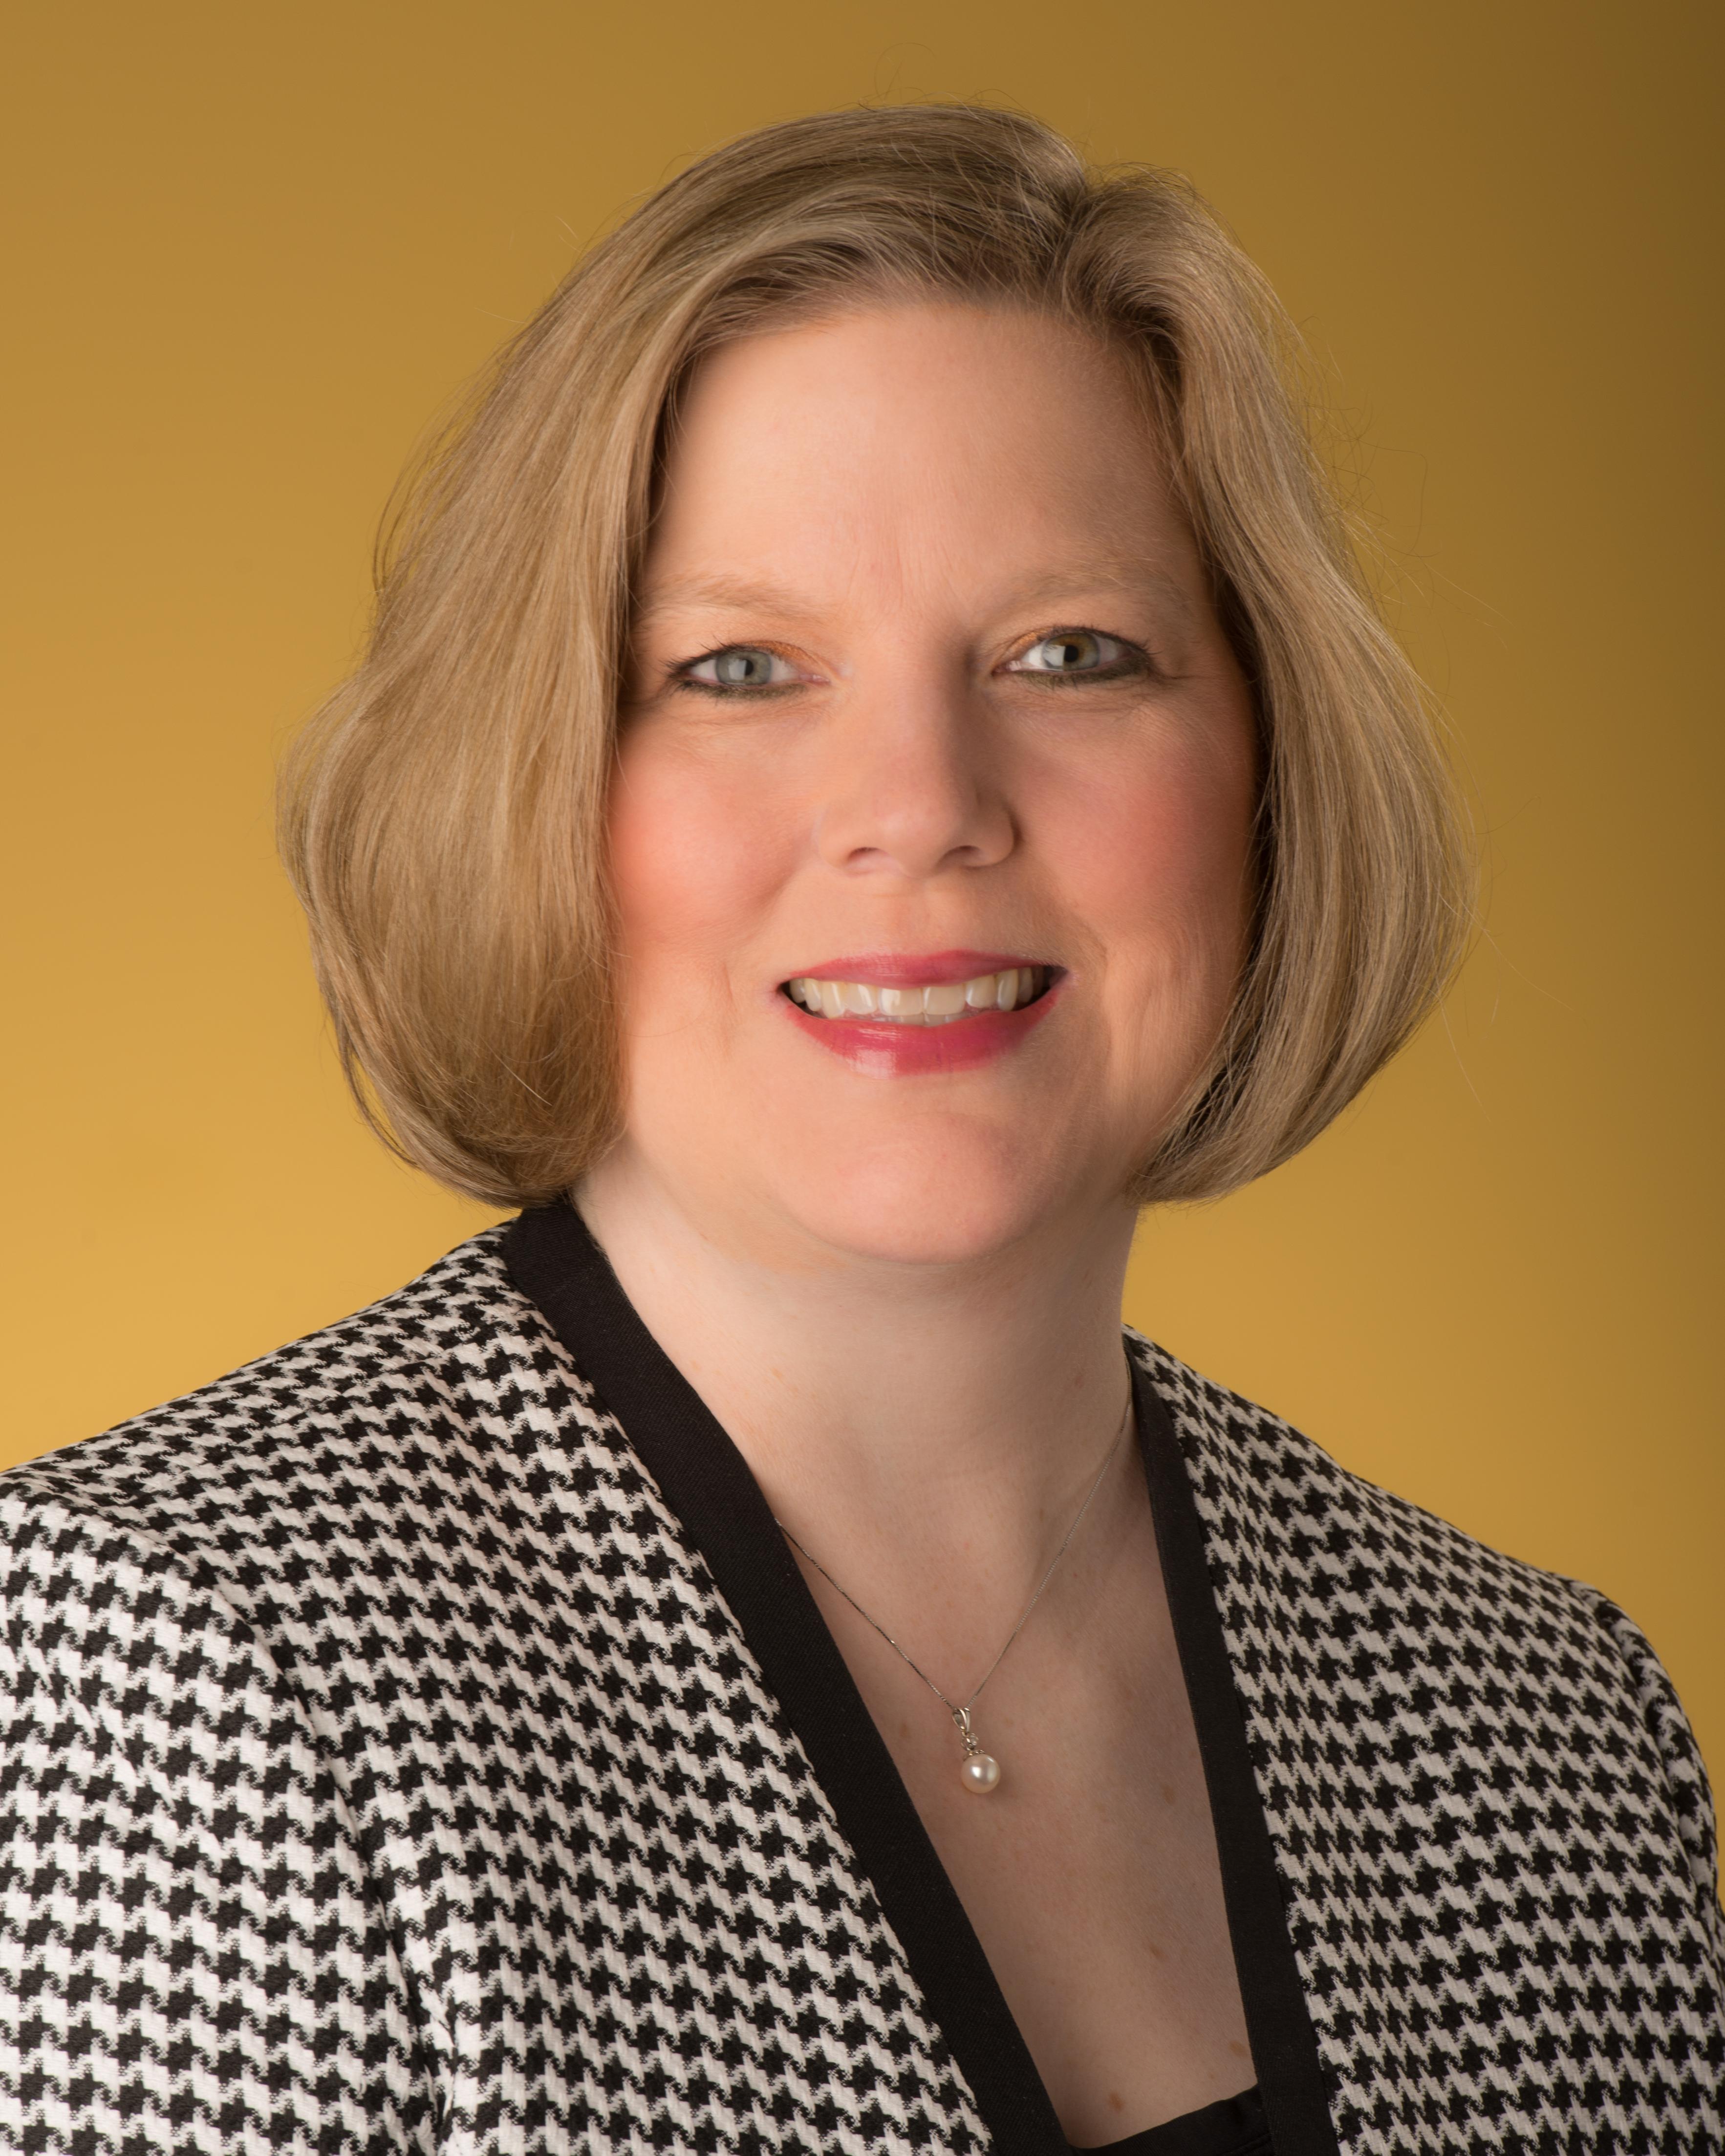 Sarah Baumhoff